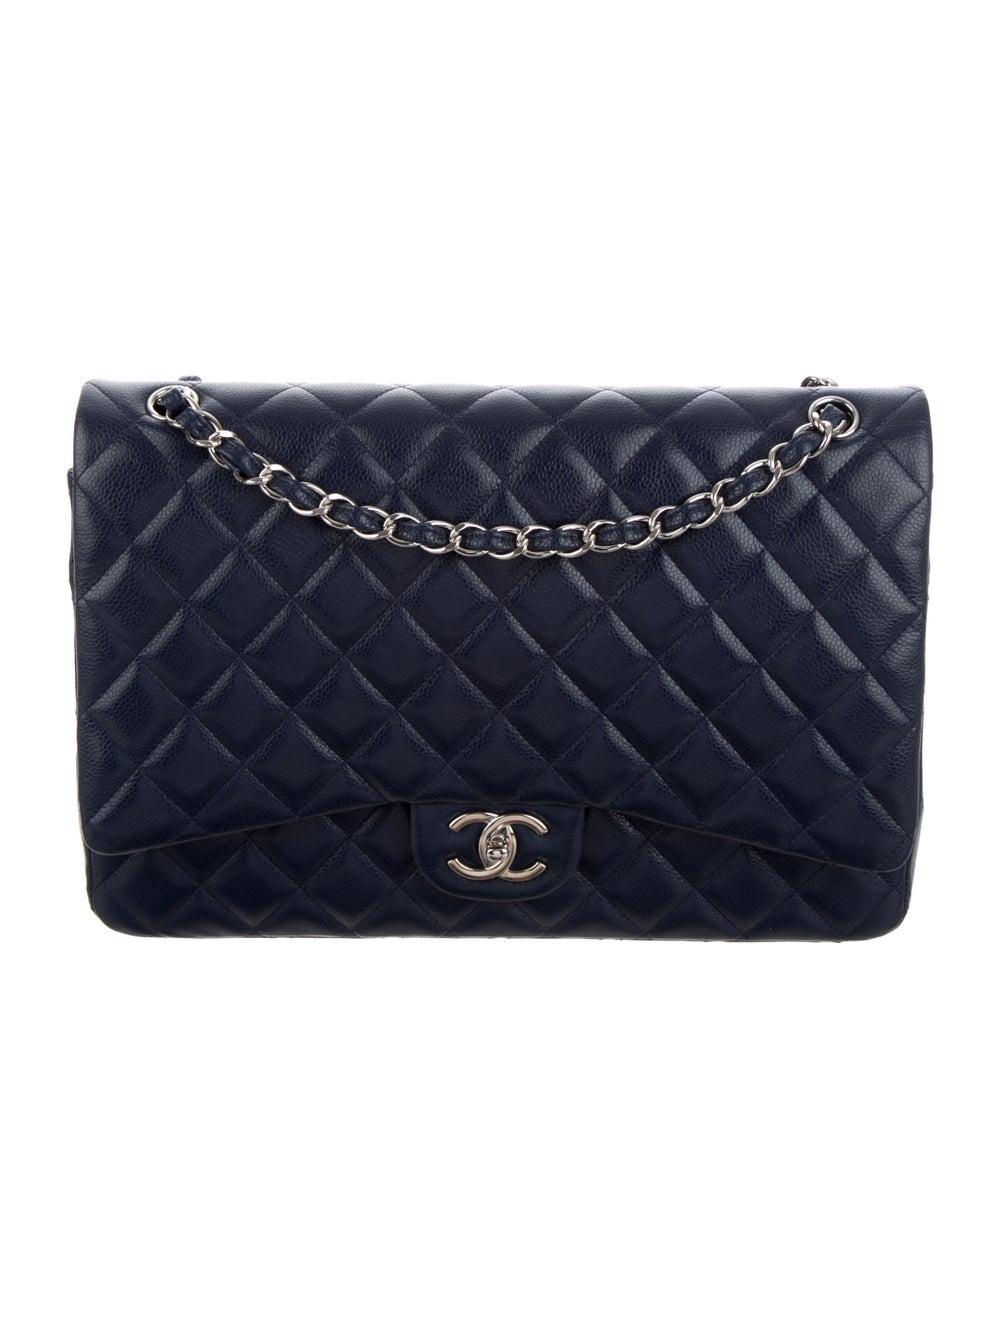 Chanel Classic Maxi Double Flap Bag Blue - image 1